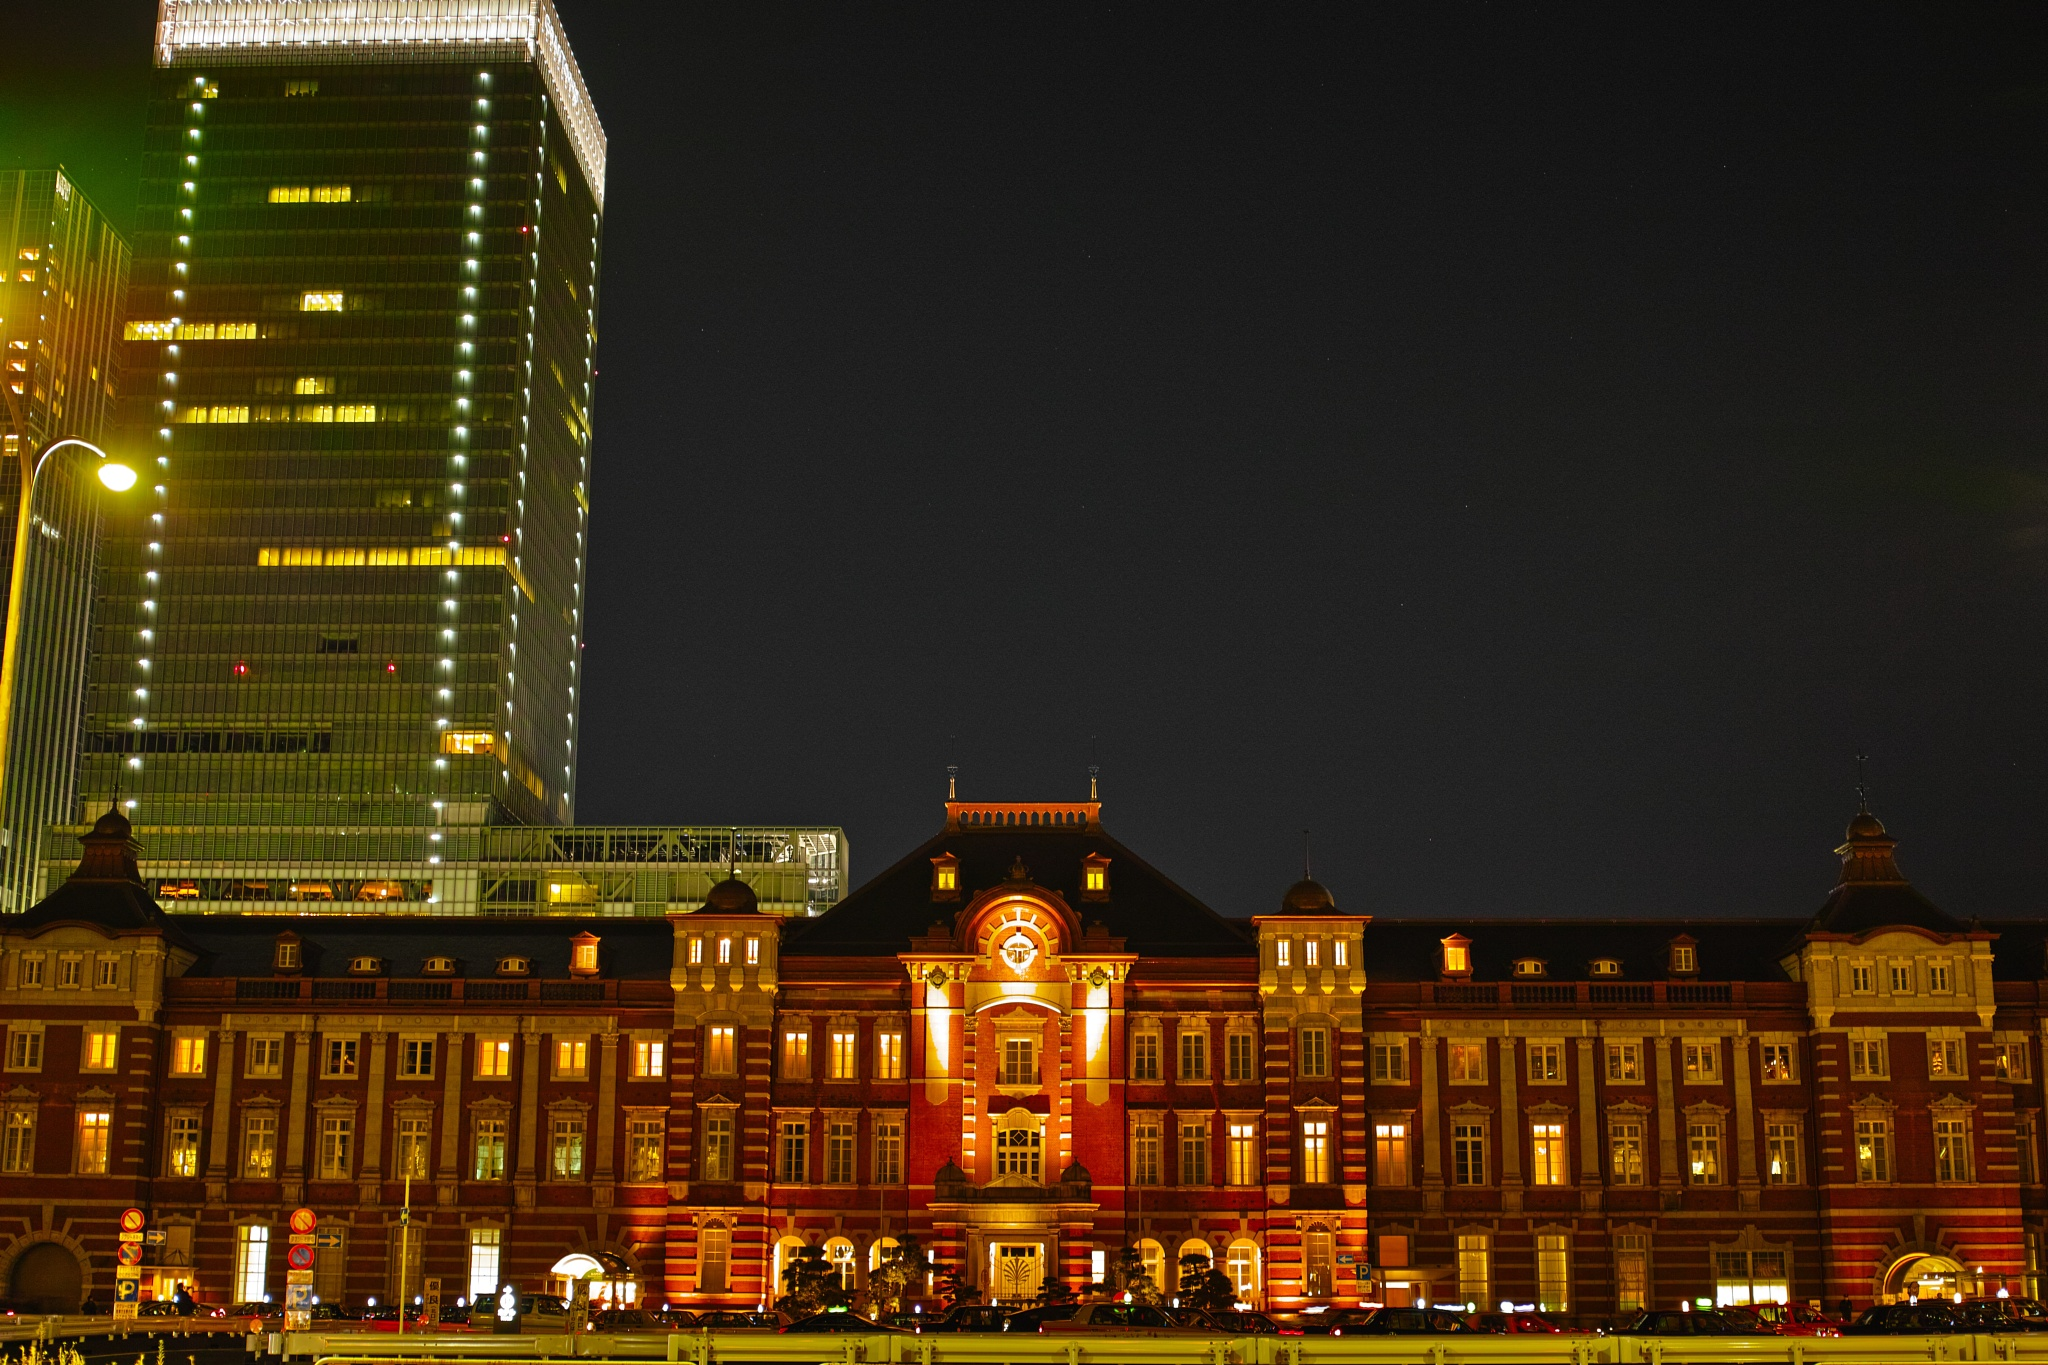 Tokyo station by H. Sugane